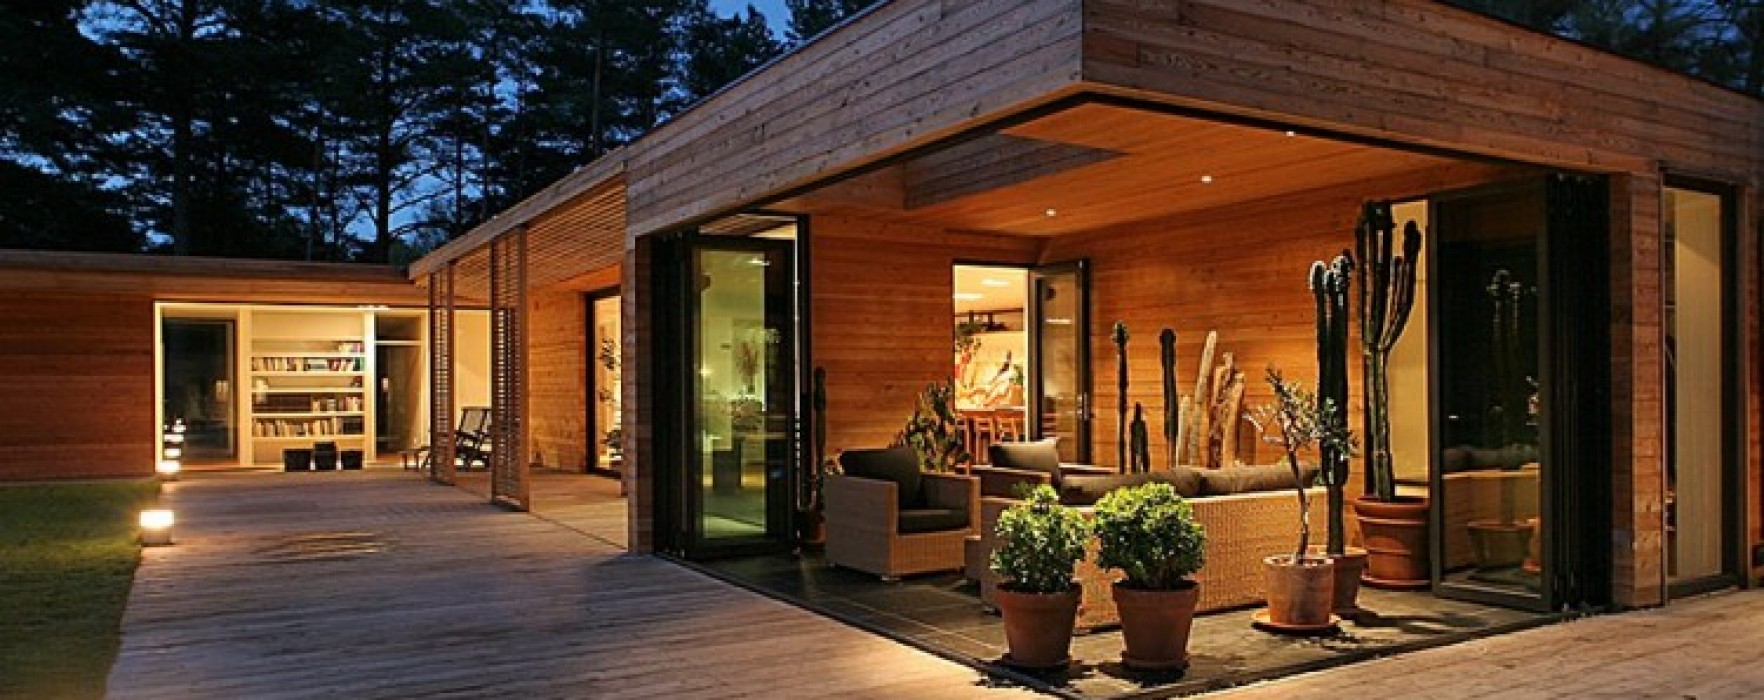 Sempre pi case di legno in ticino for Case moderne in legno